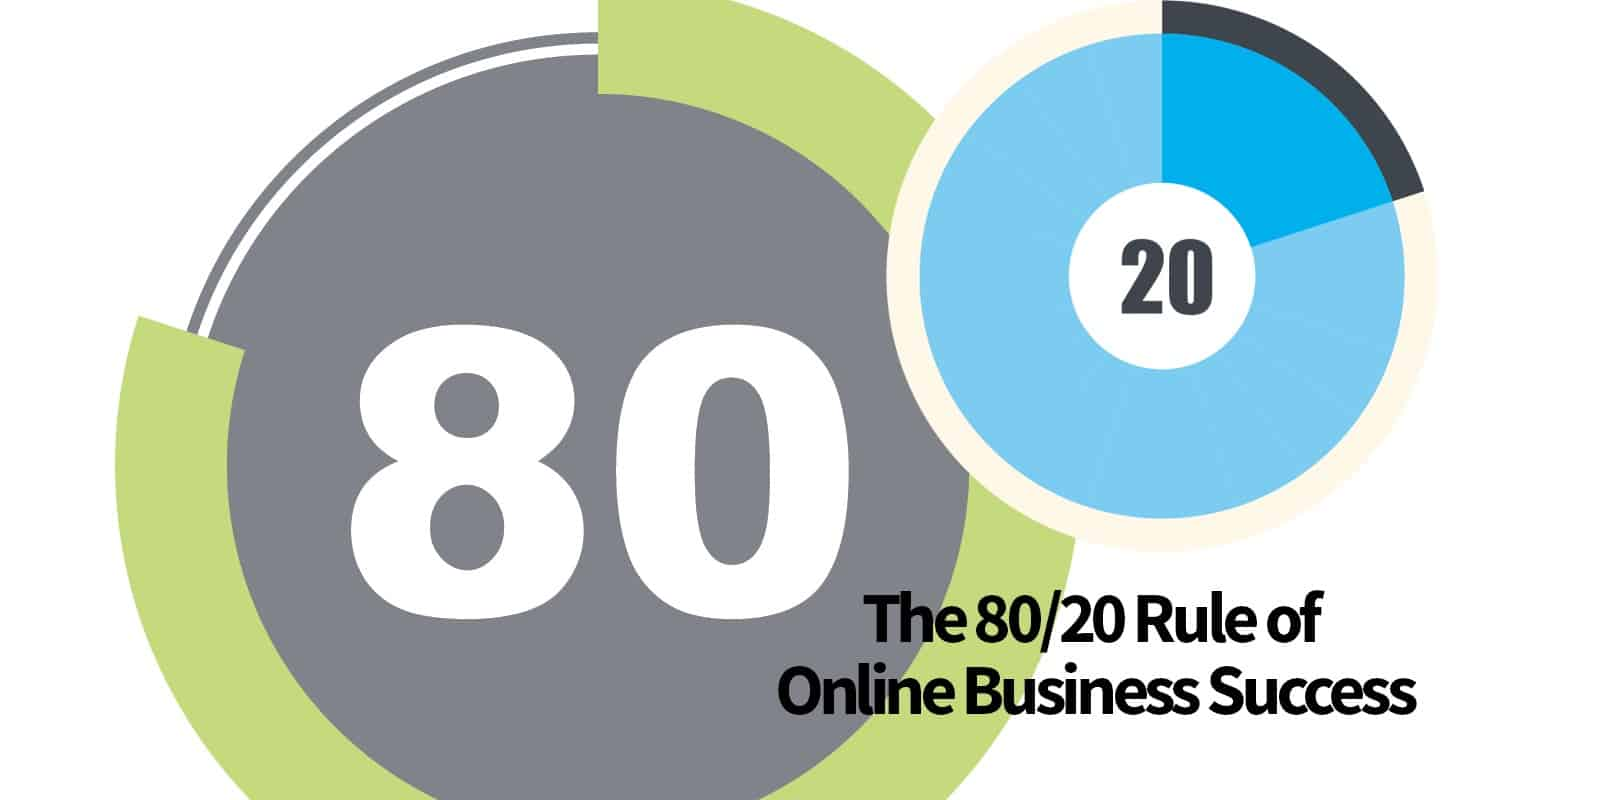 Online Business 80/20 Rule